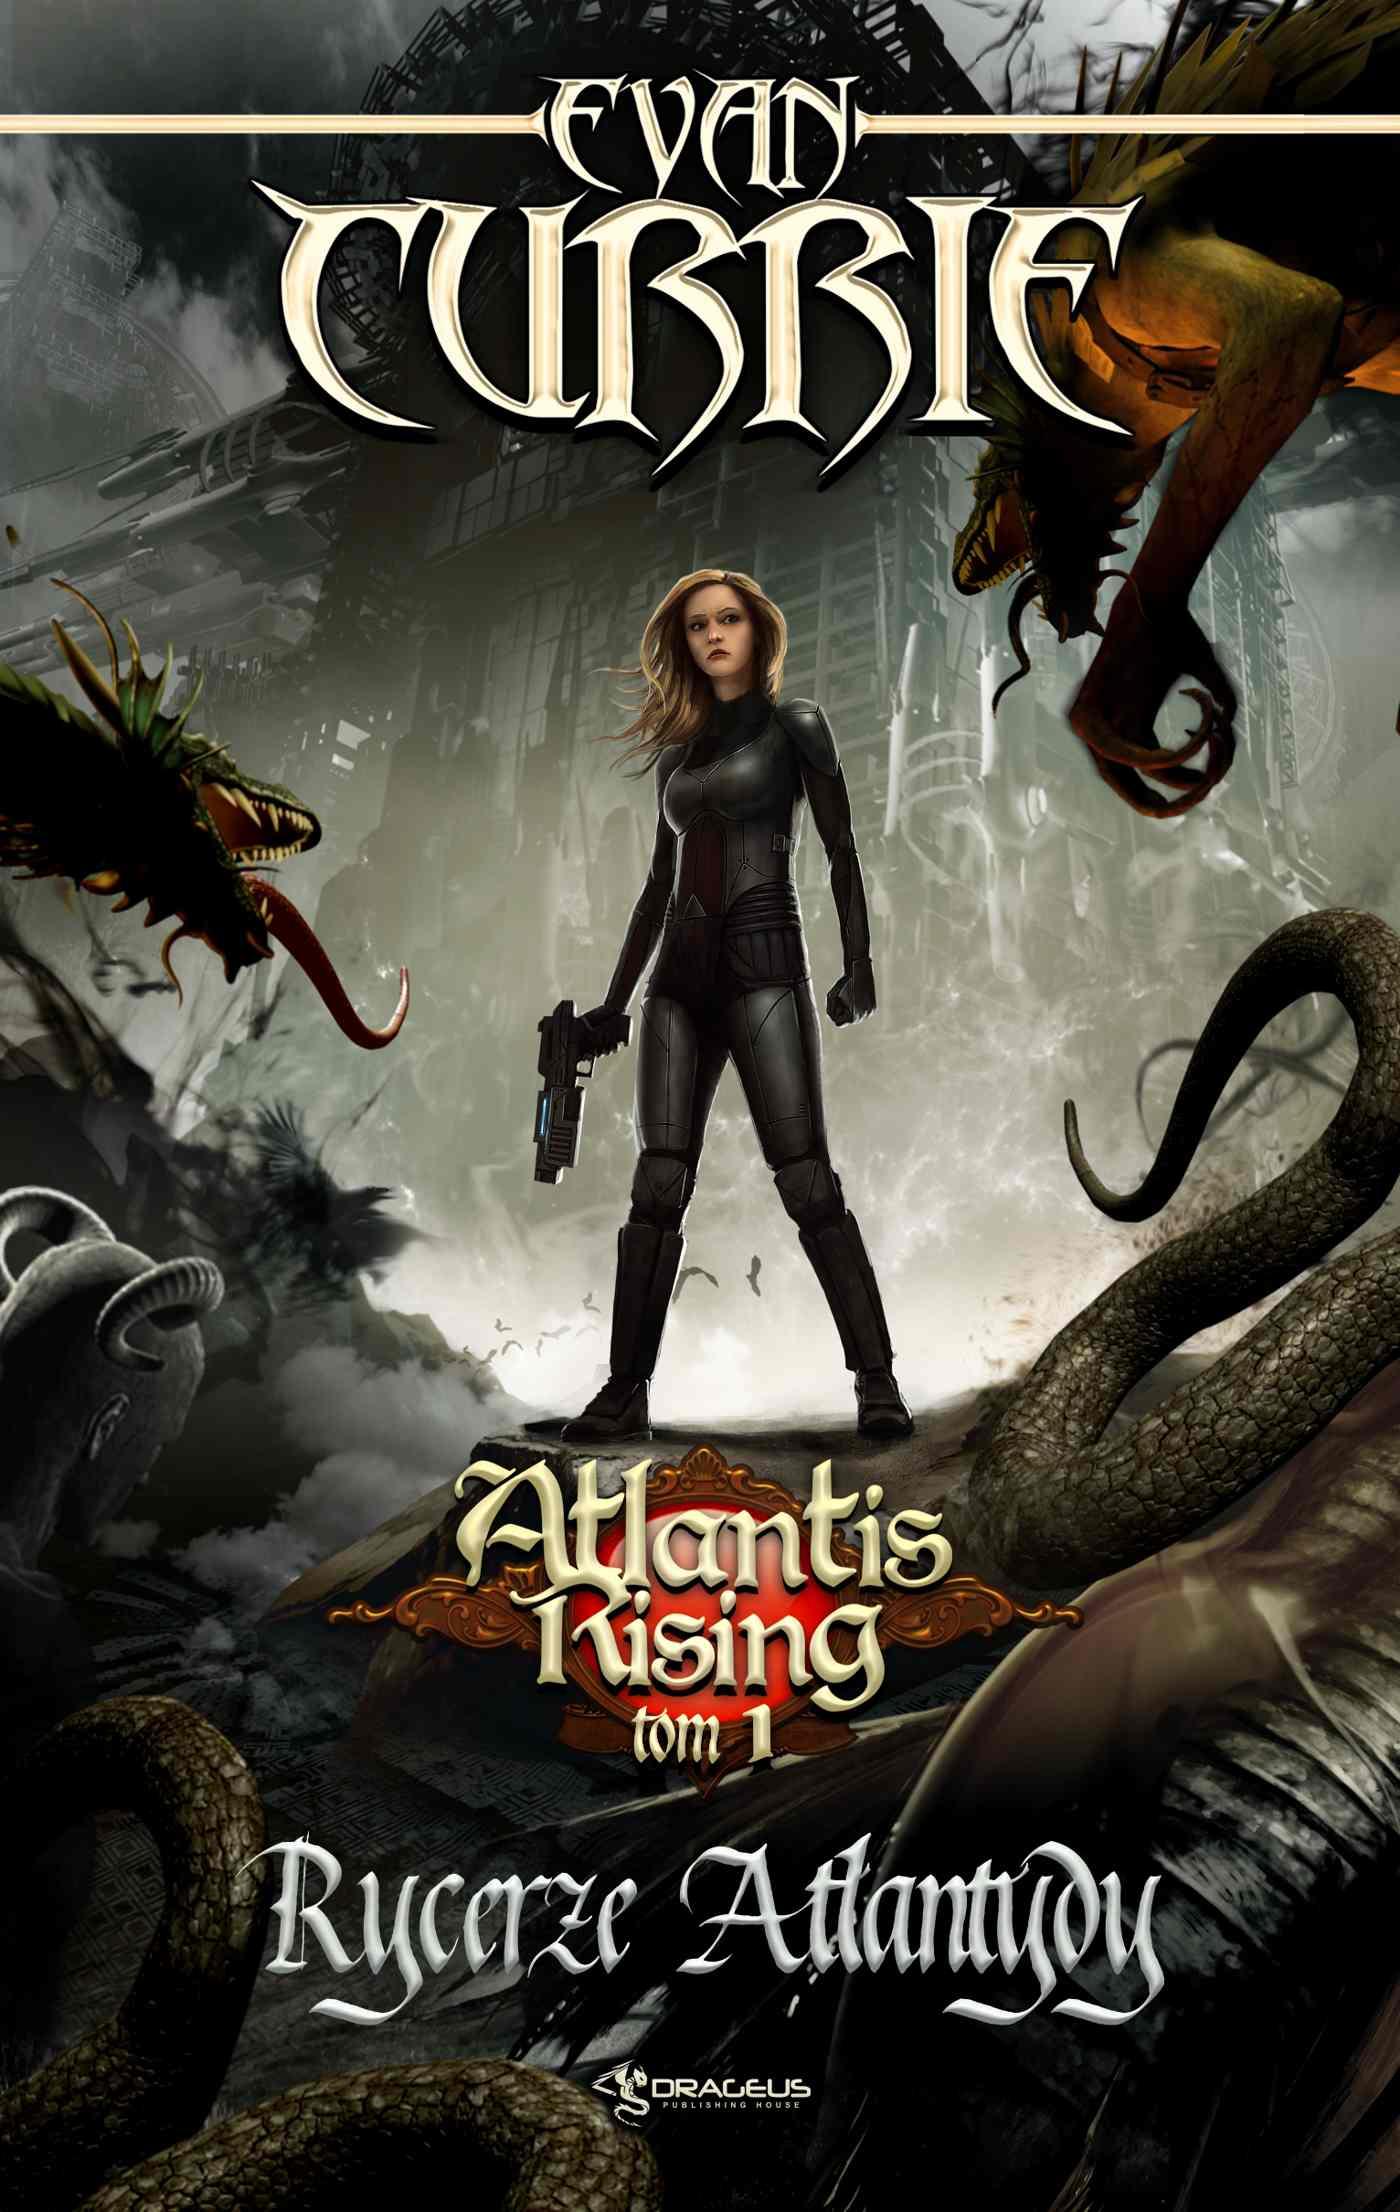 Atlantis Rising. Tom 1. Rycerze Atlantydy - Ebook (Książka na Kindle) do pobrania w formacie MOBI